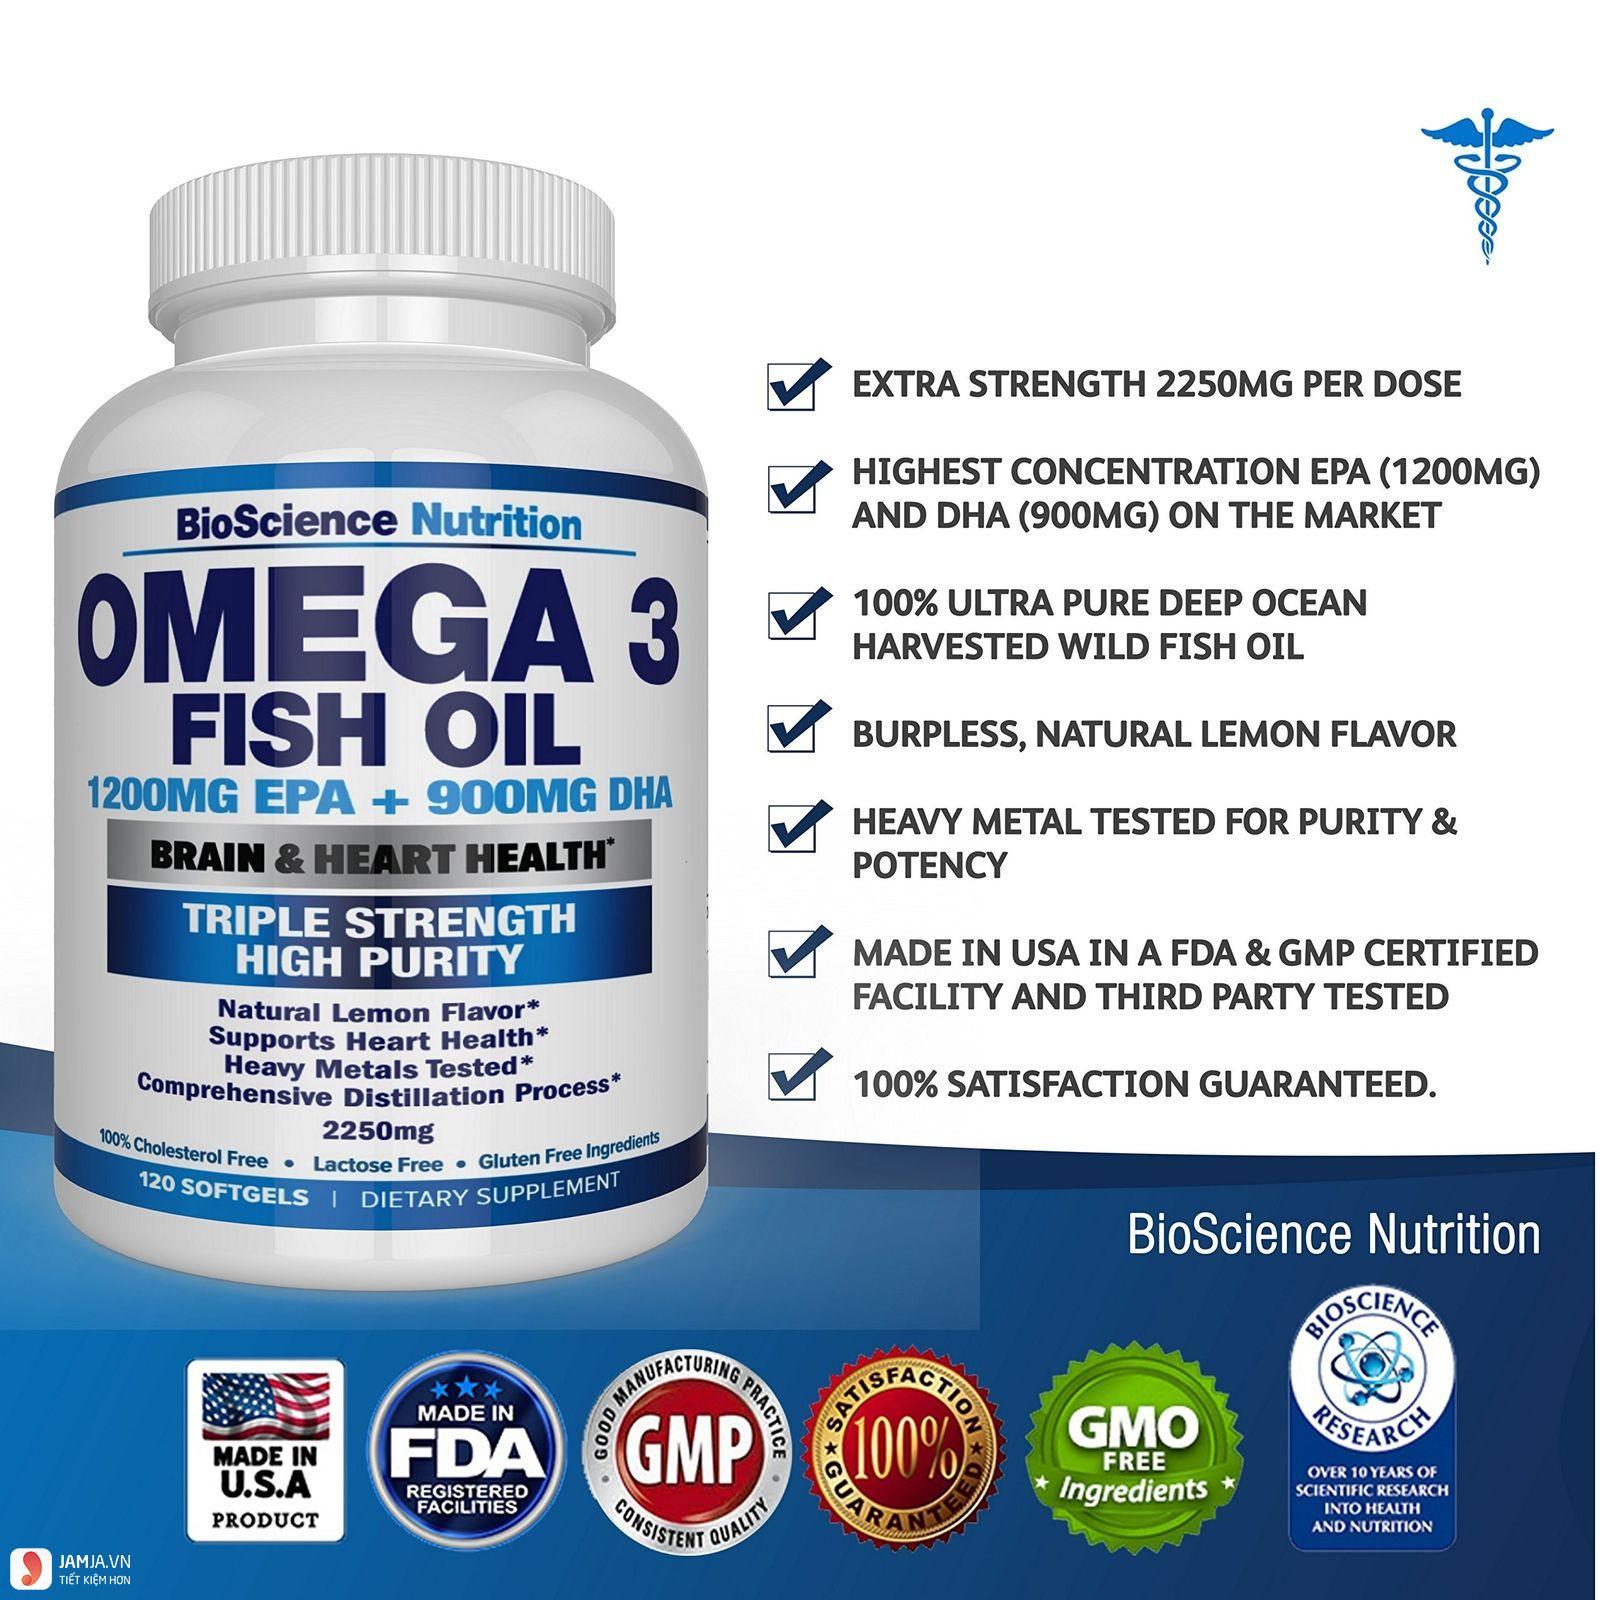 BioScience Nutrition Omega 3 Fish Oil